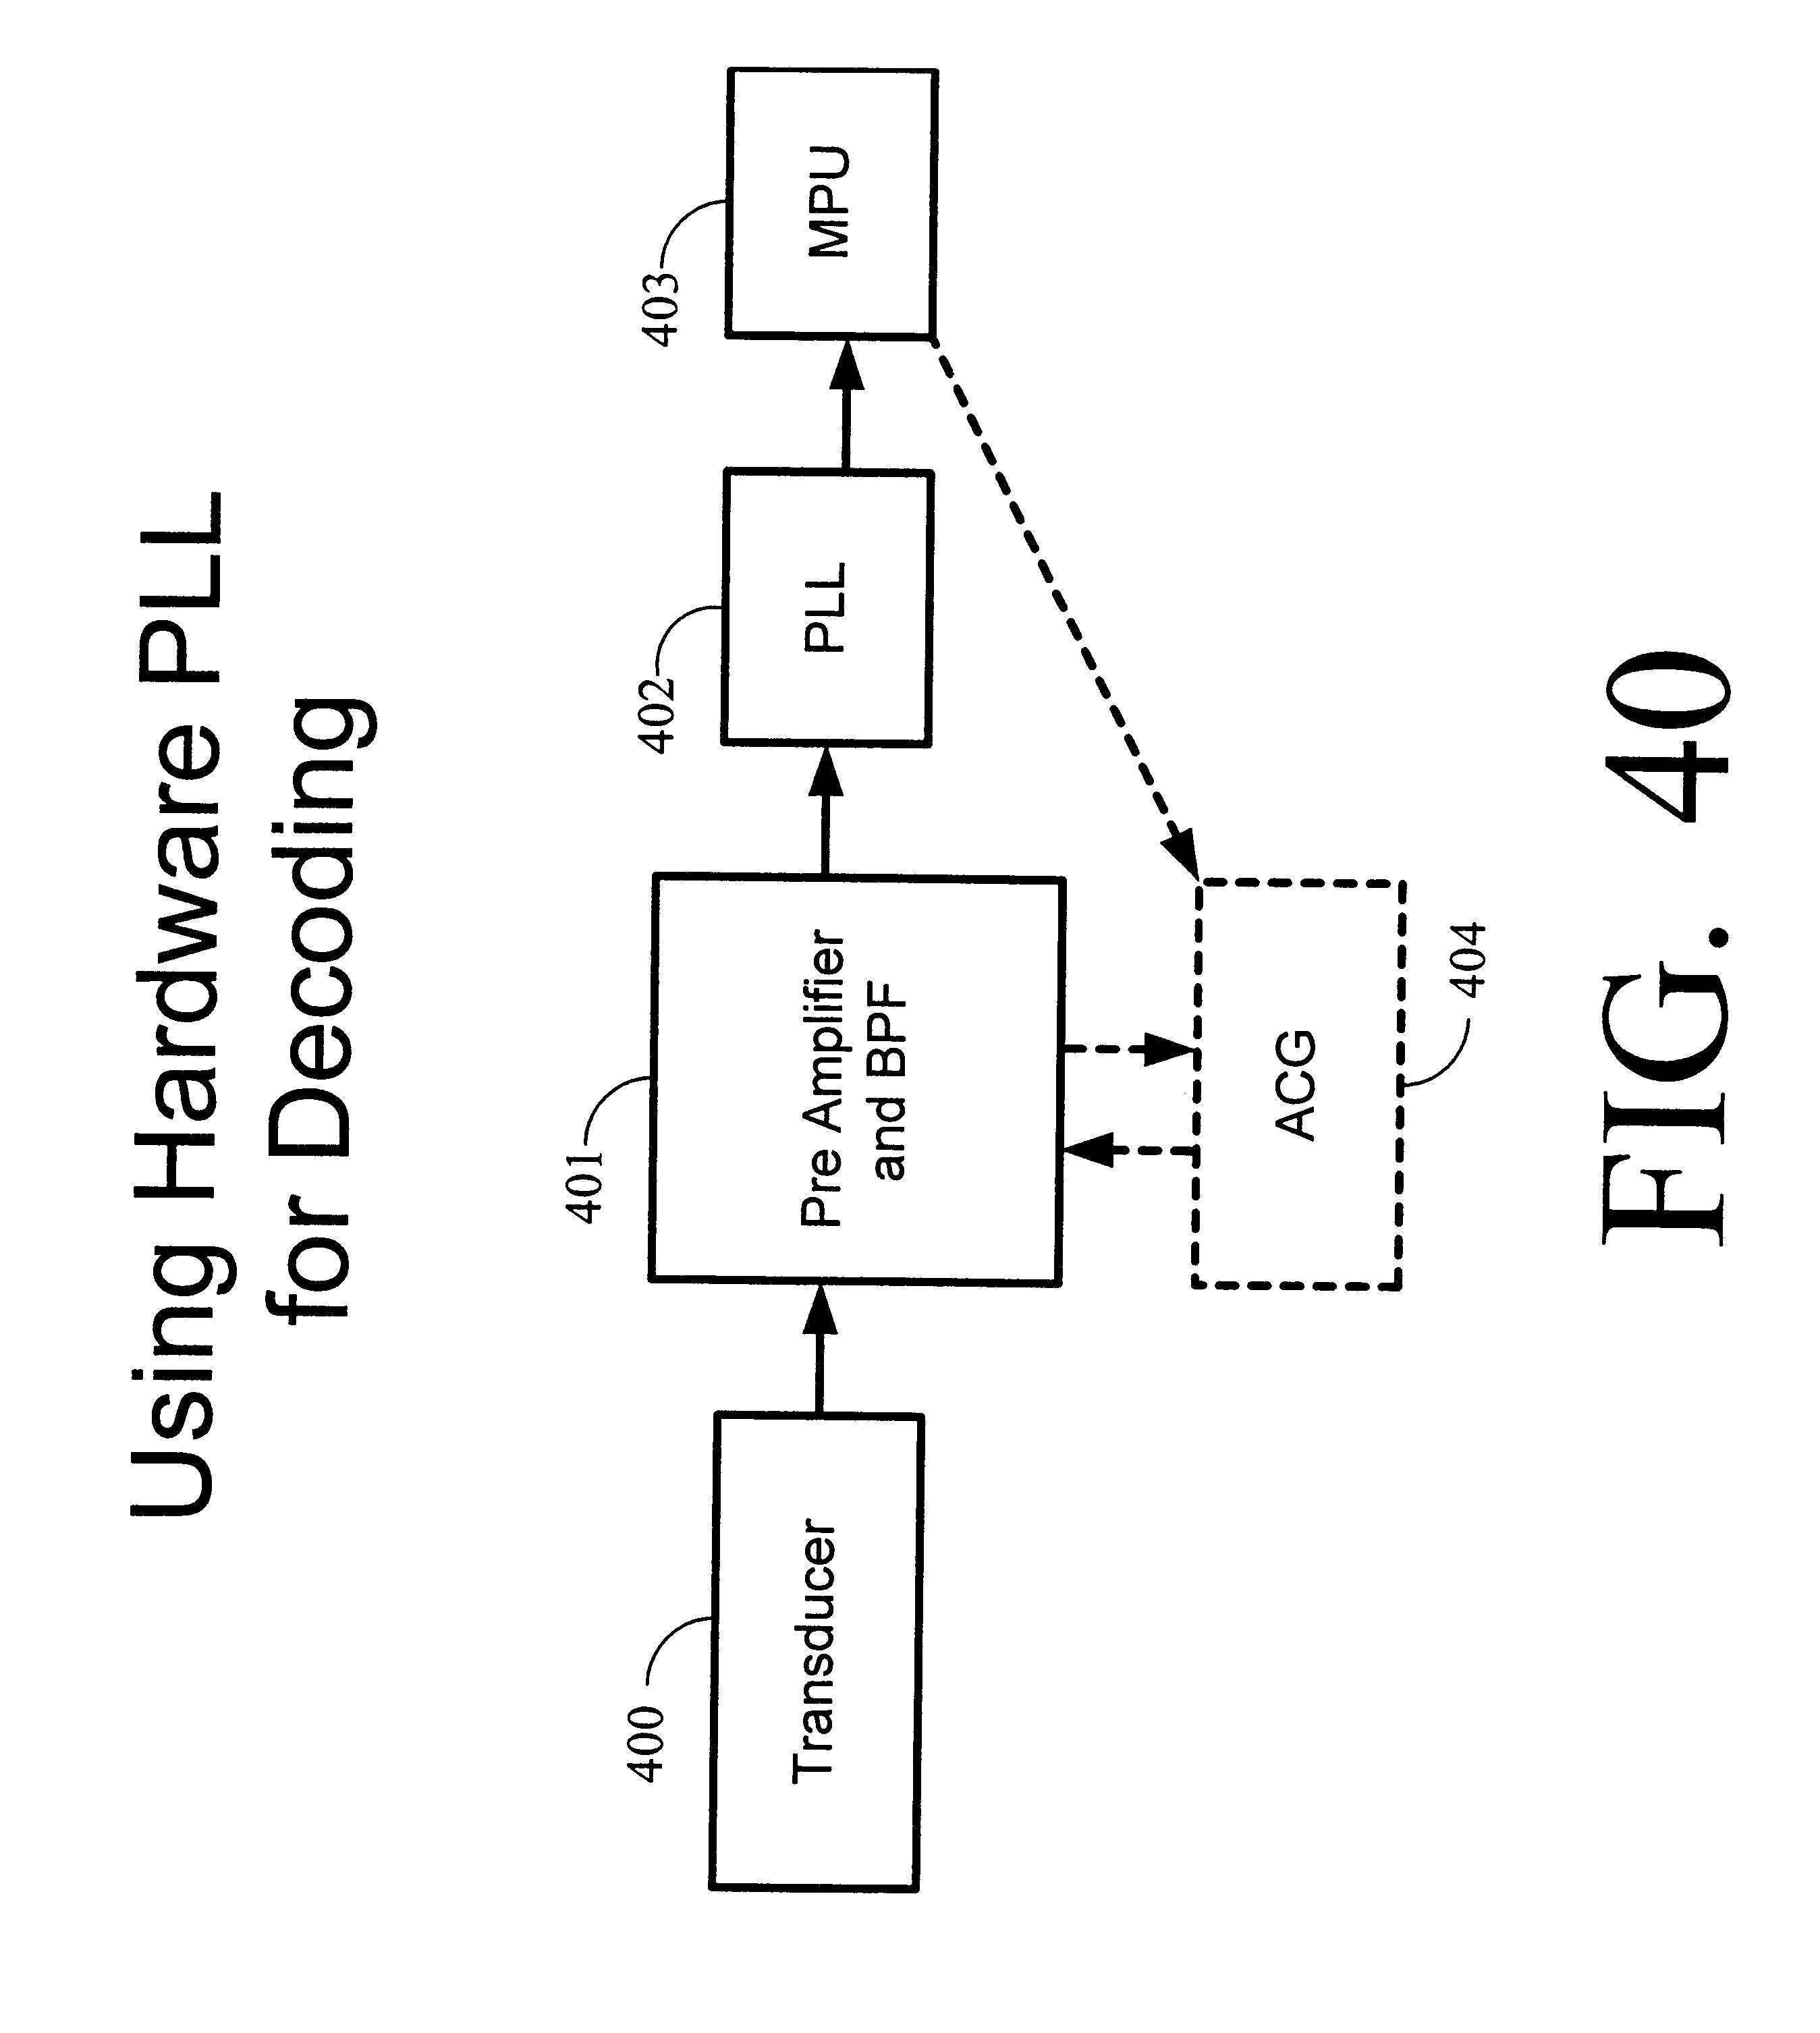 Patent Us 6607136 B1 Xr2211 Linear Fm Detector Simple Circuit Diagram Images